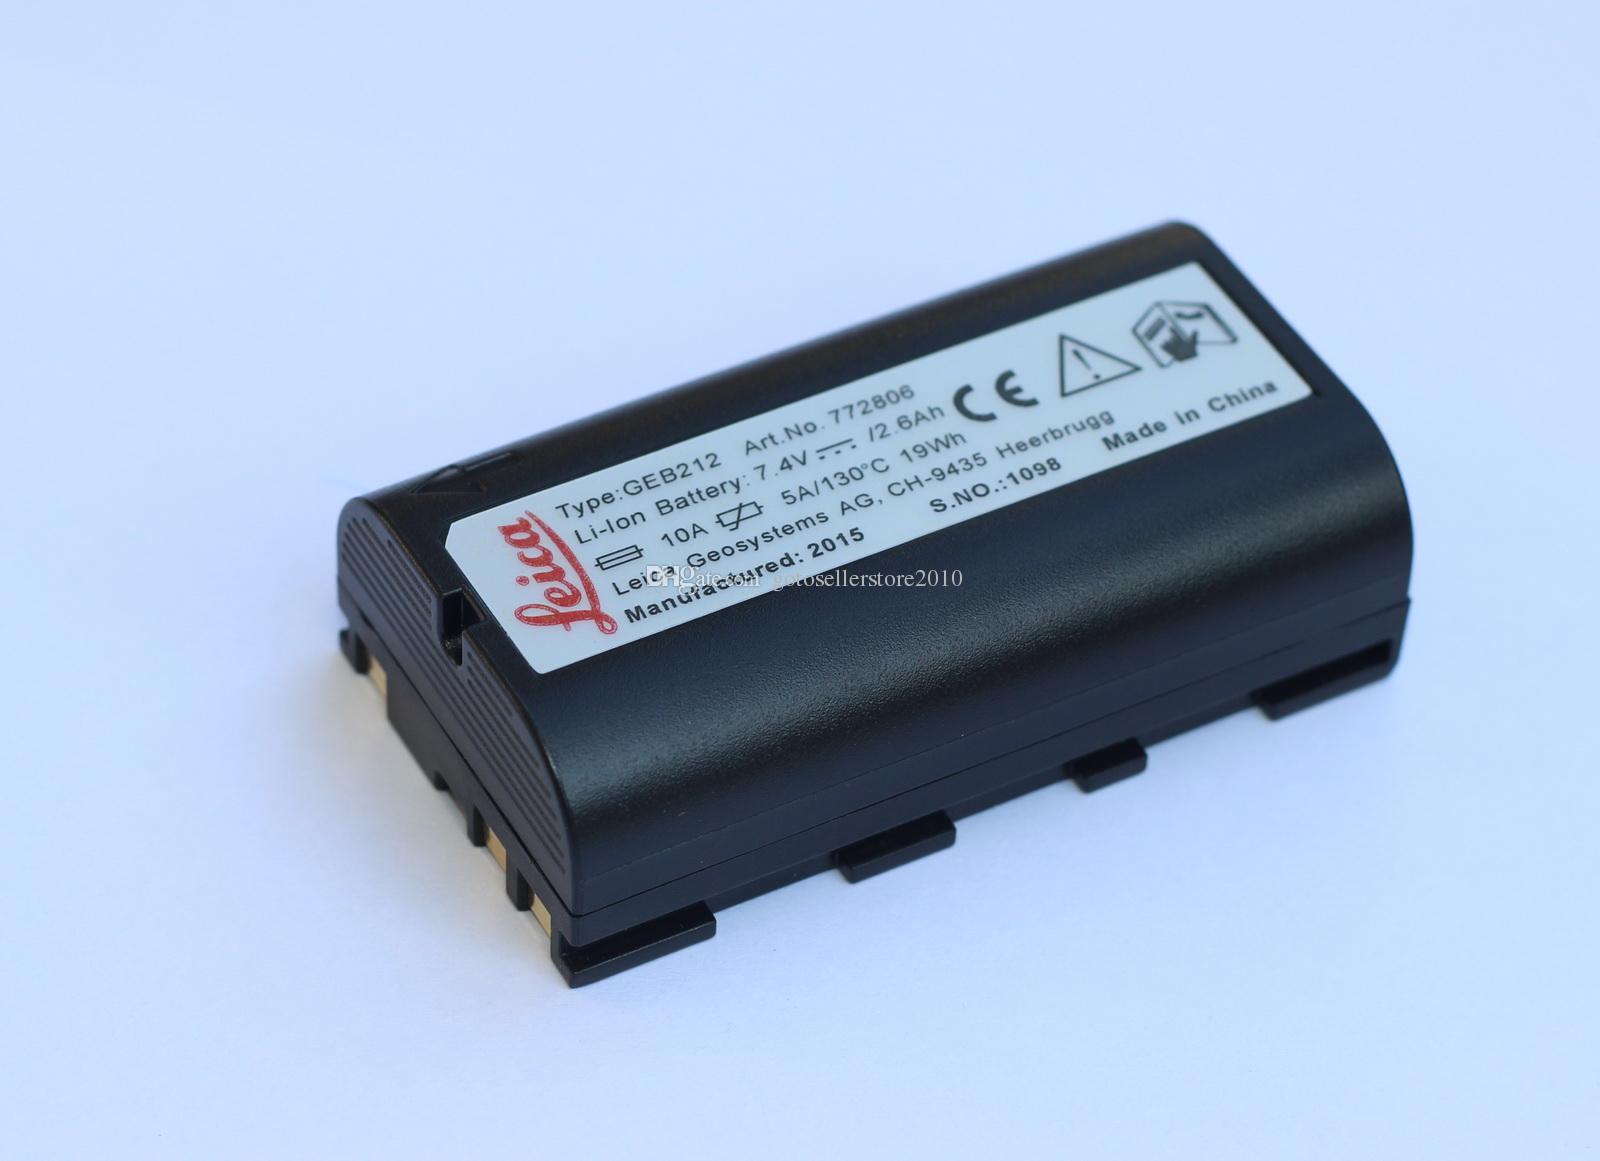 Perakende / Toptan Yeni GEB211 GEB212 Li-ion 2.6Ah pil Için leica ATX1200 RX1200 GPS1200 GRX1200 / GPS ücretsiz post kargo